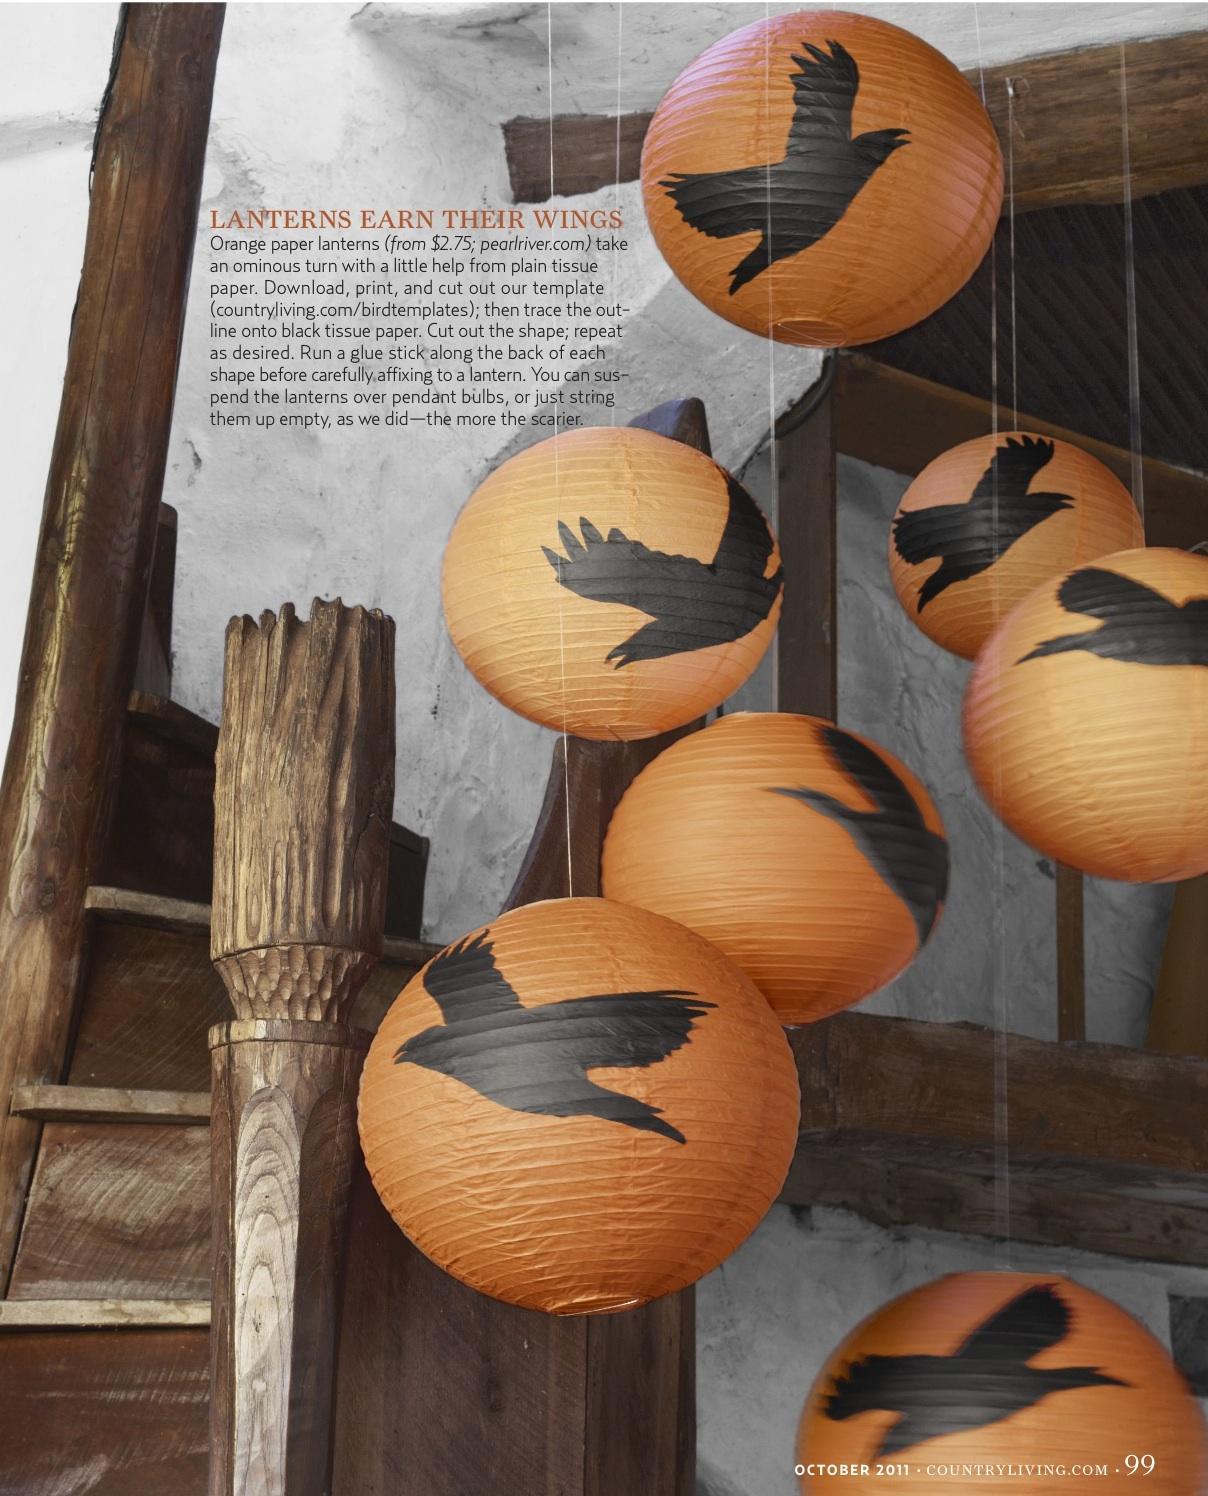 halloweenbirdslanterns.jpg